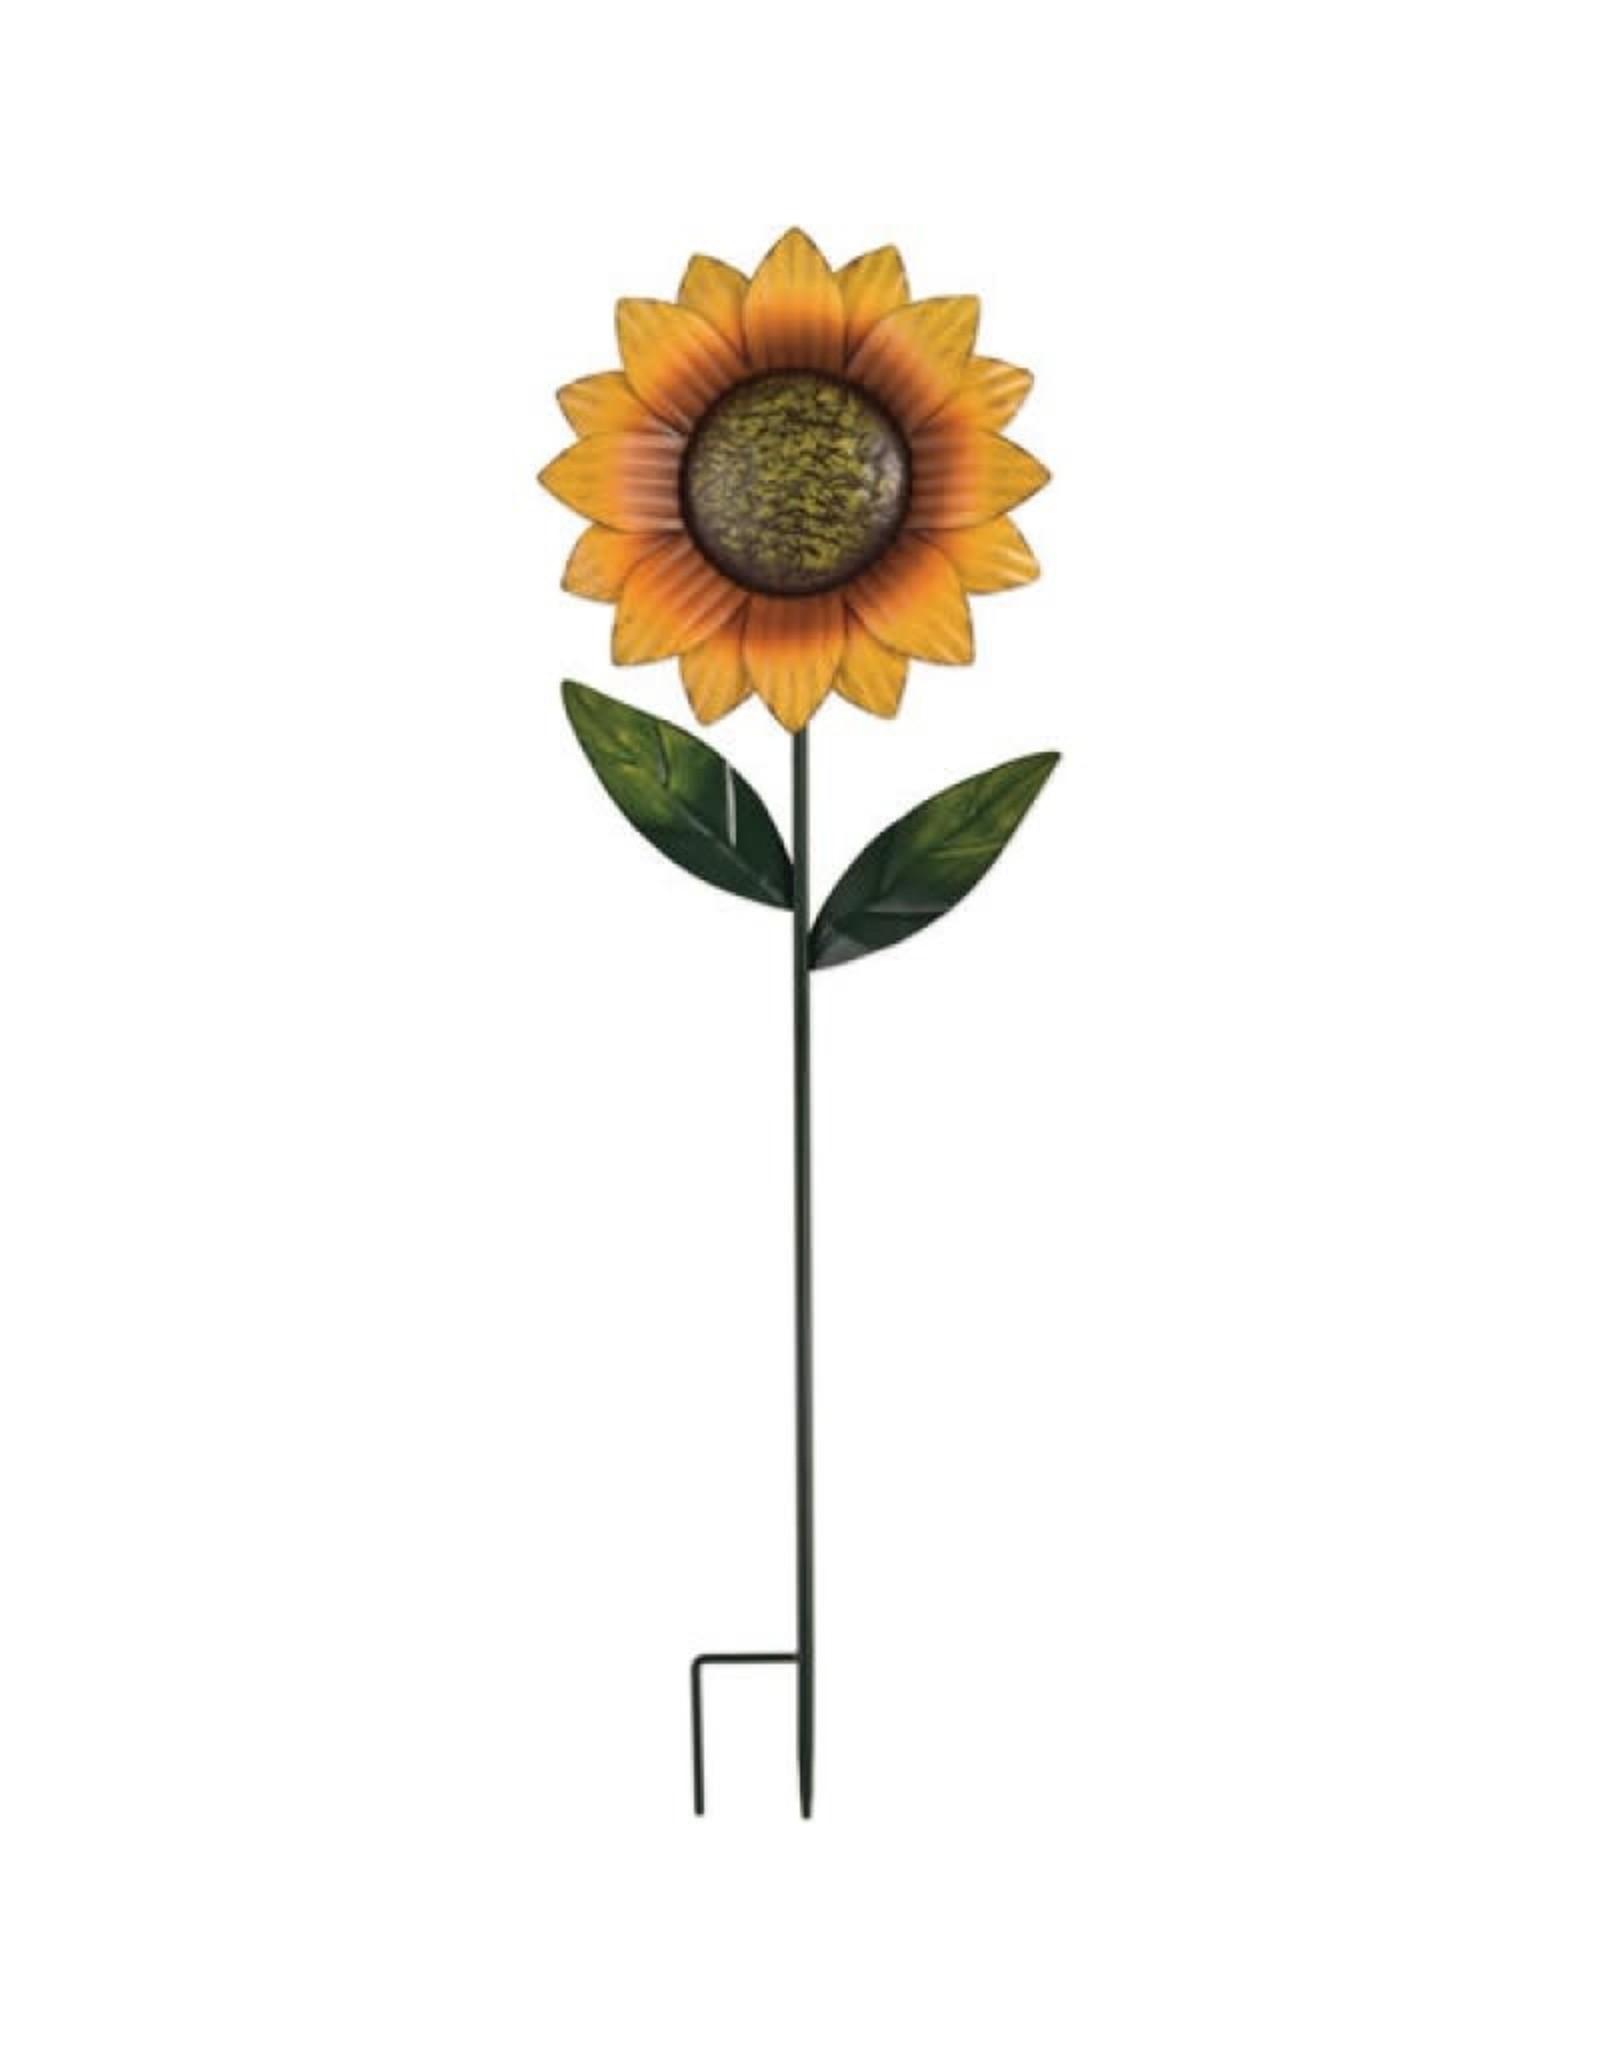 Garden Stake - Rustic Sunflower Medium